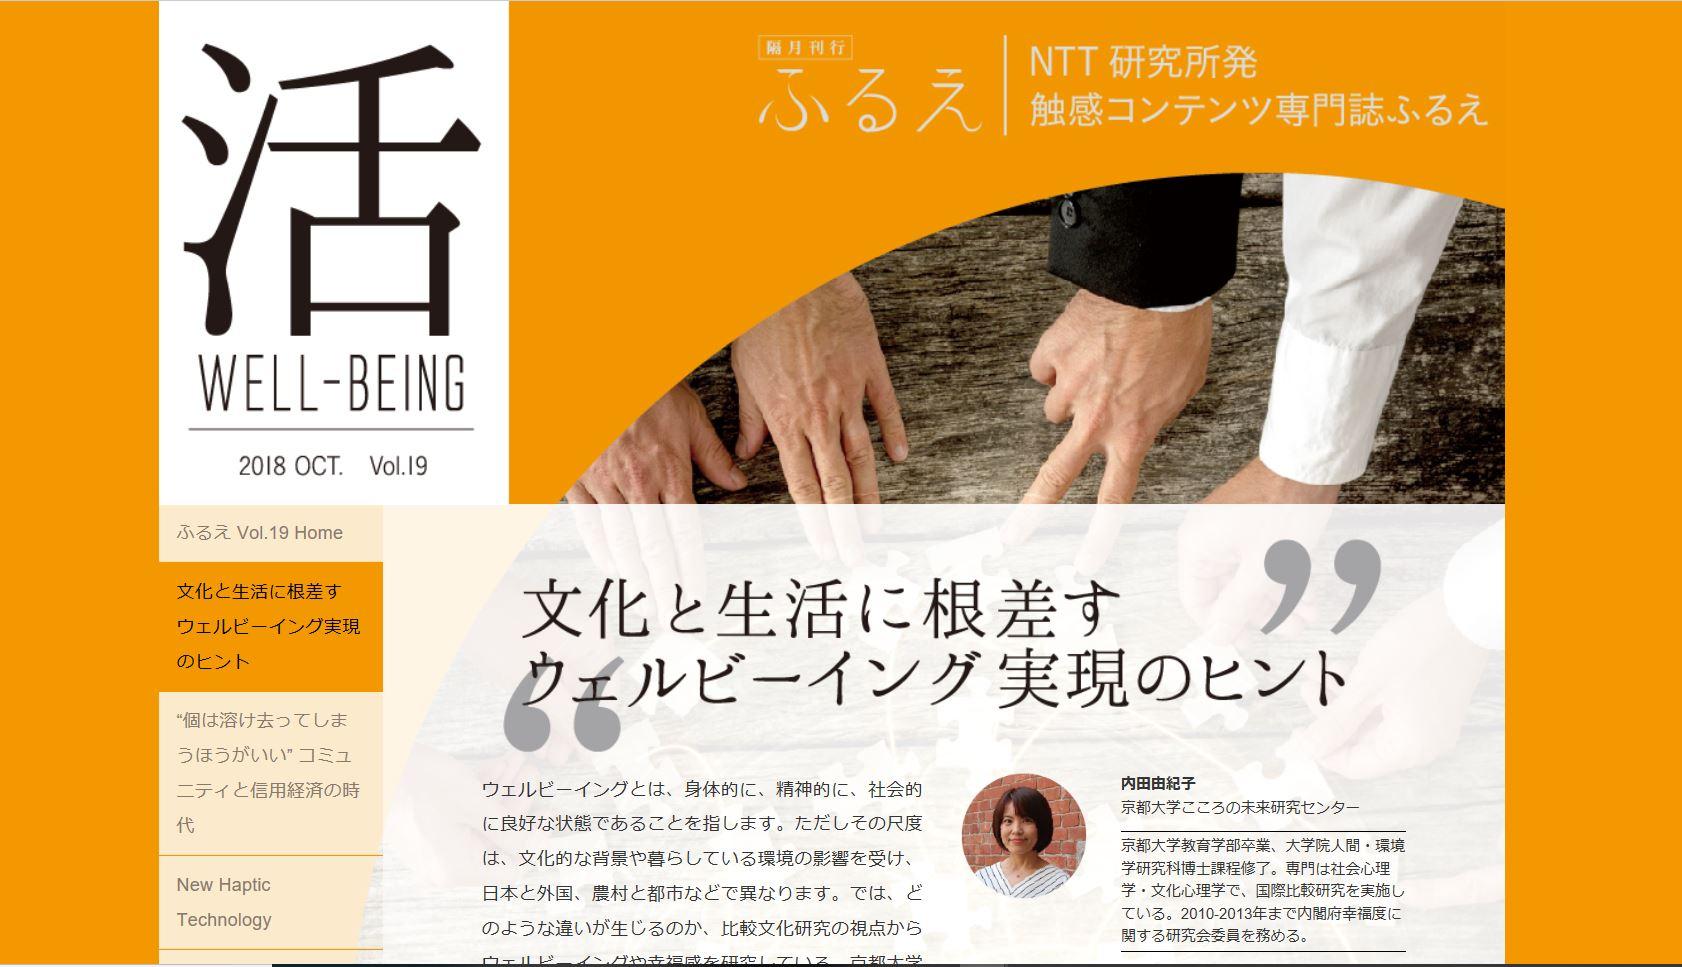 NTT研究所発 「触感コンテンツ専門誌ふるえ」10月号に内田由紀子准教授のインタビューが掲載されました